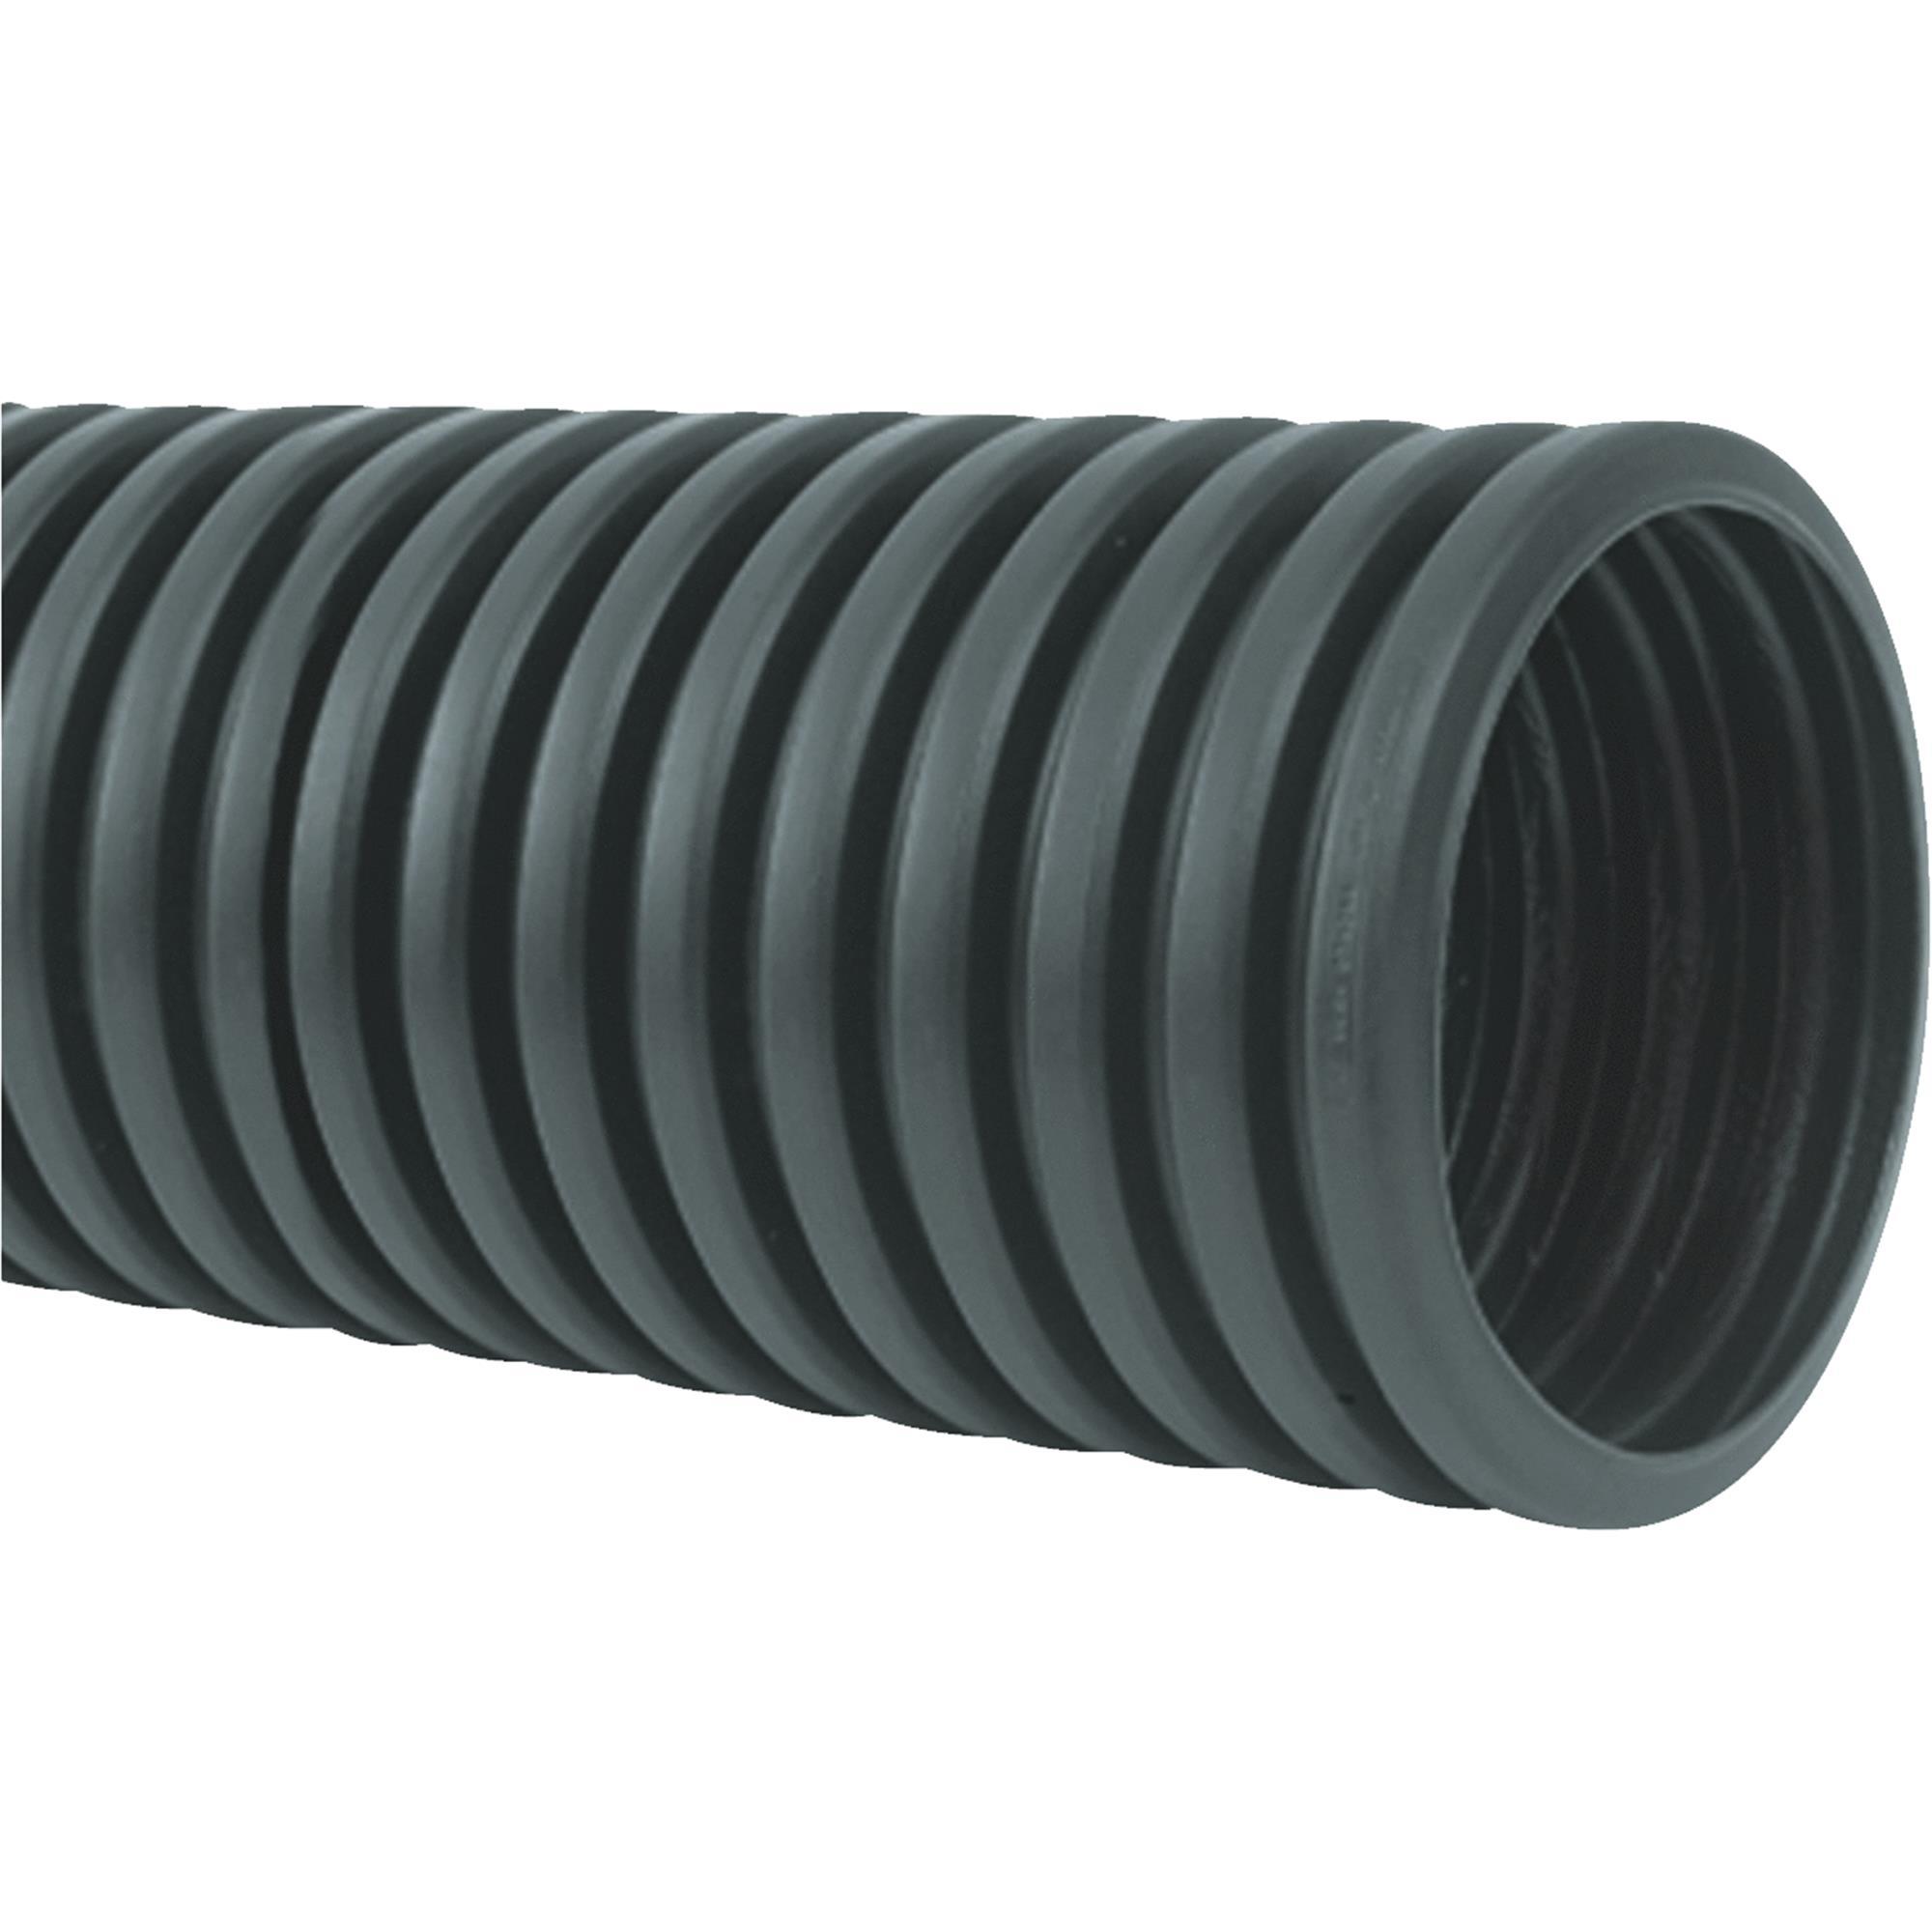 Image of Advanced Basement Heavy-Duty ASTM F405 Polyethylene Corrugated Tubing